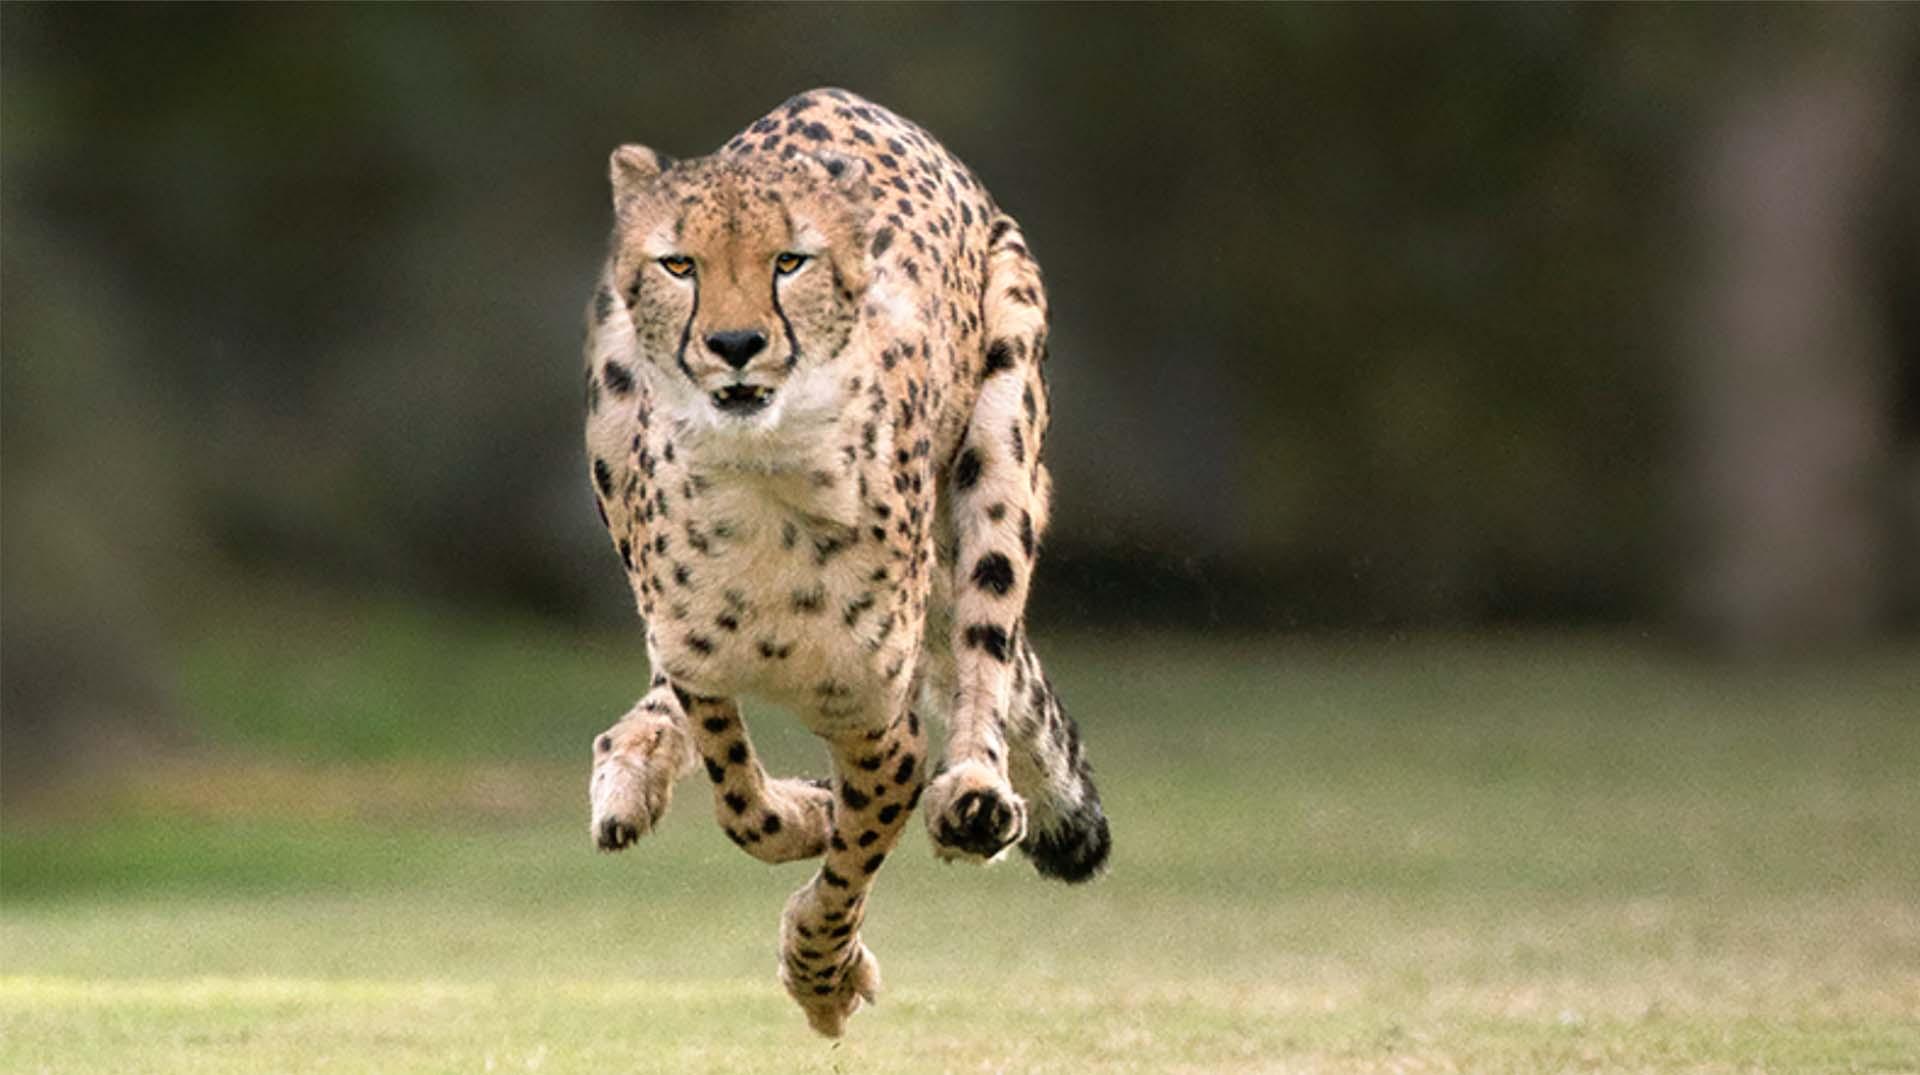 Cheetah running photos